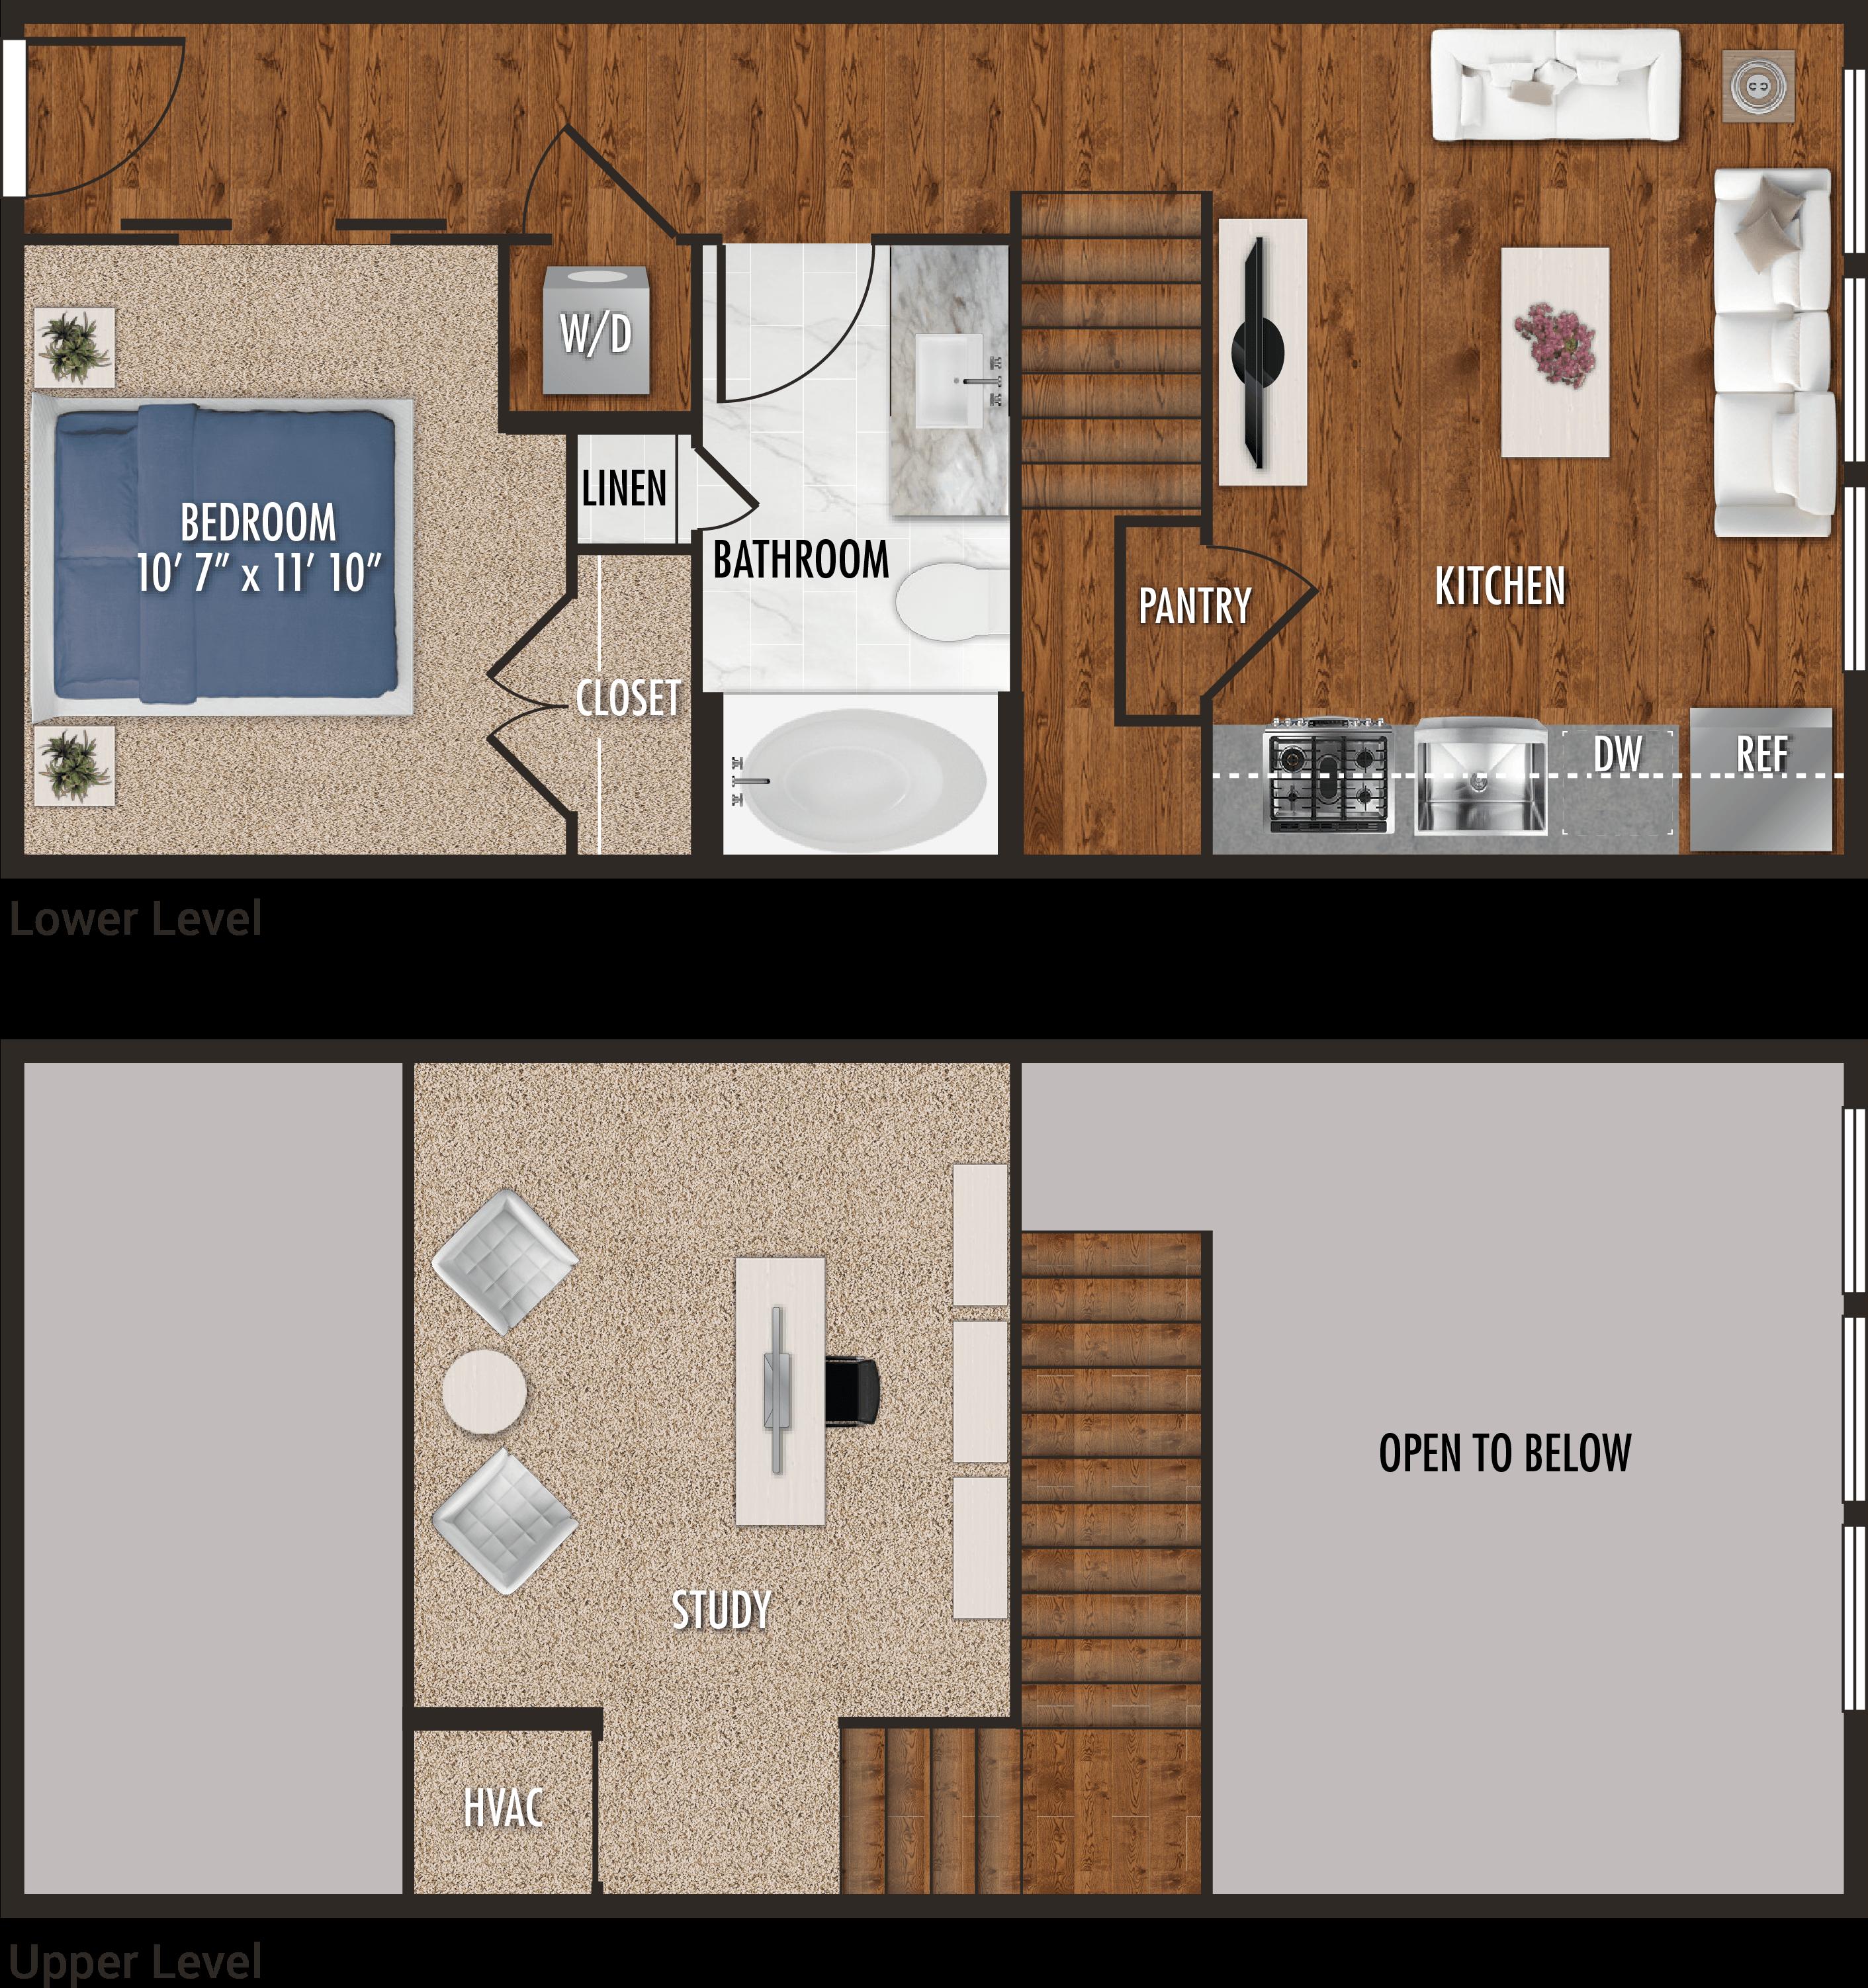 E2-M - Studio Floor Plan for Alexan 5151